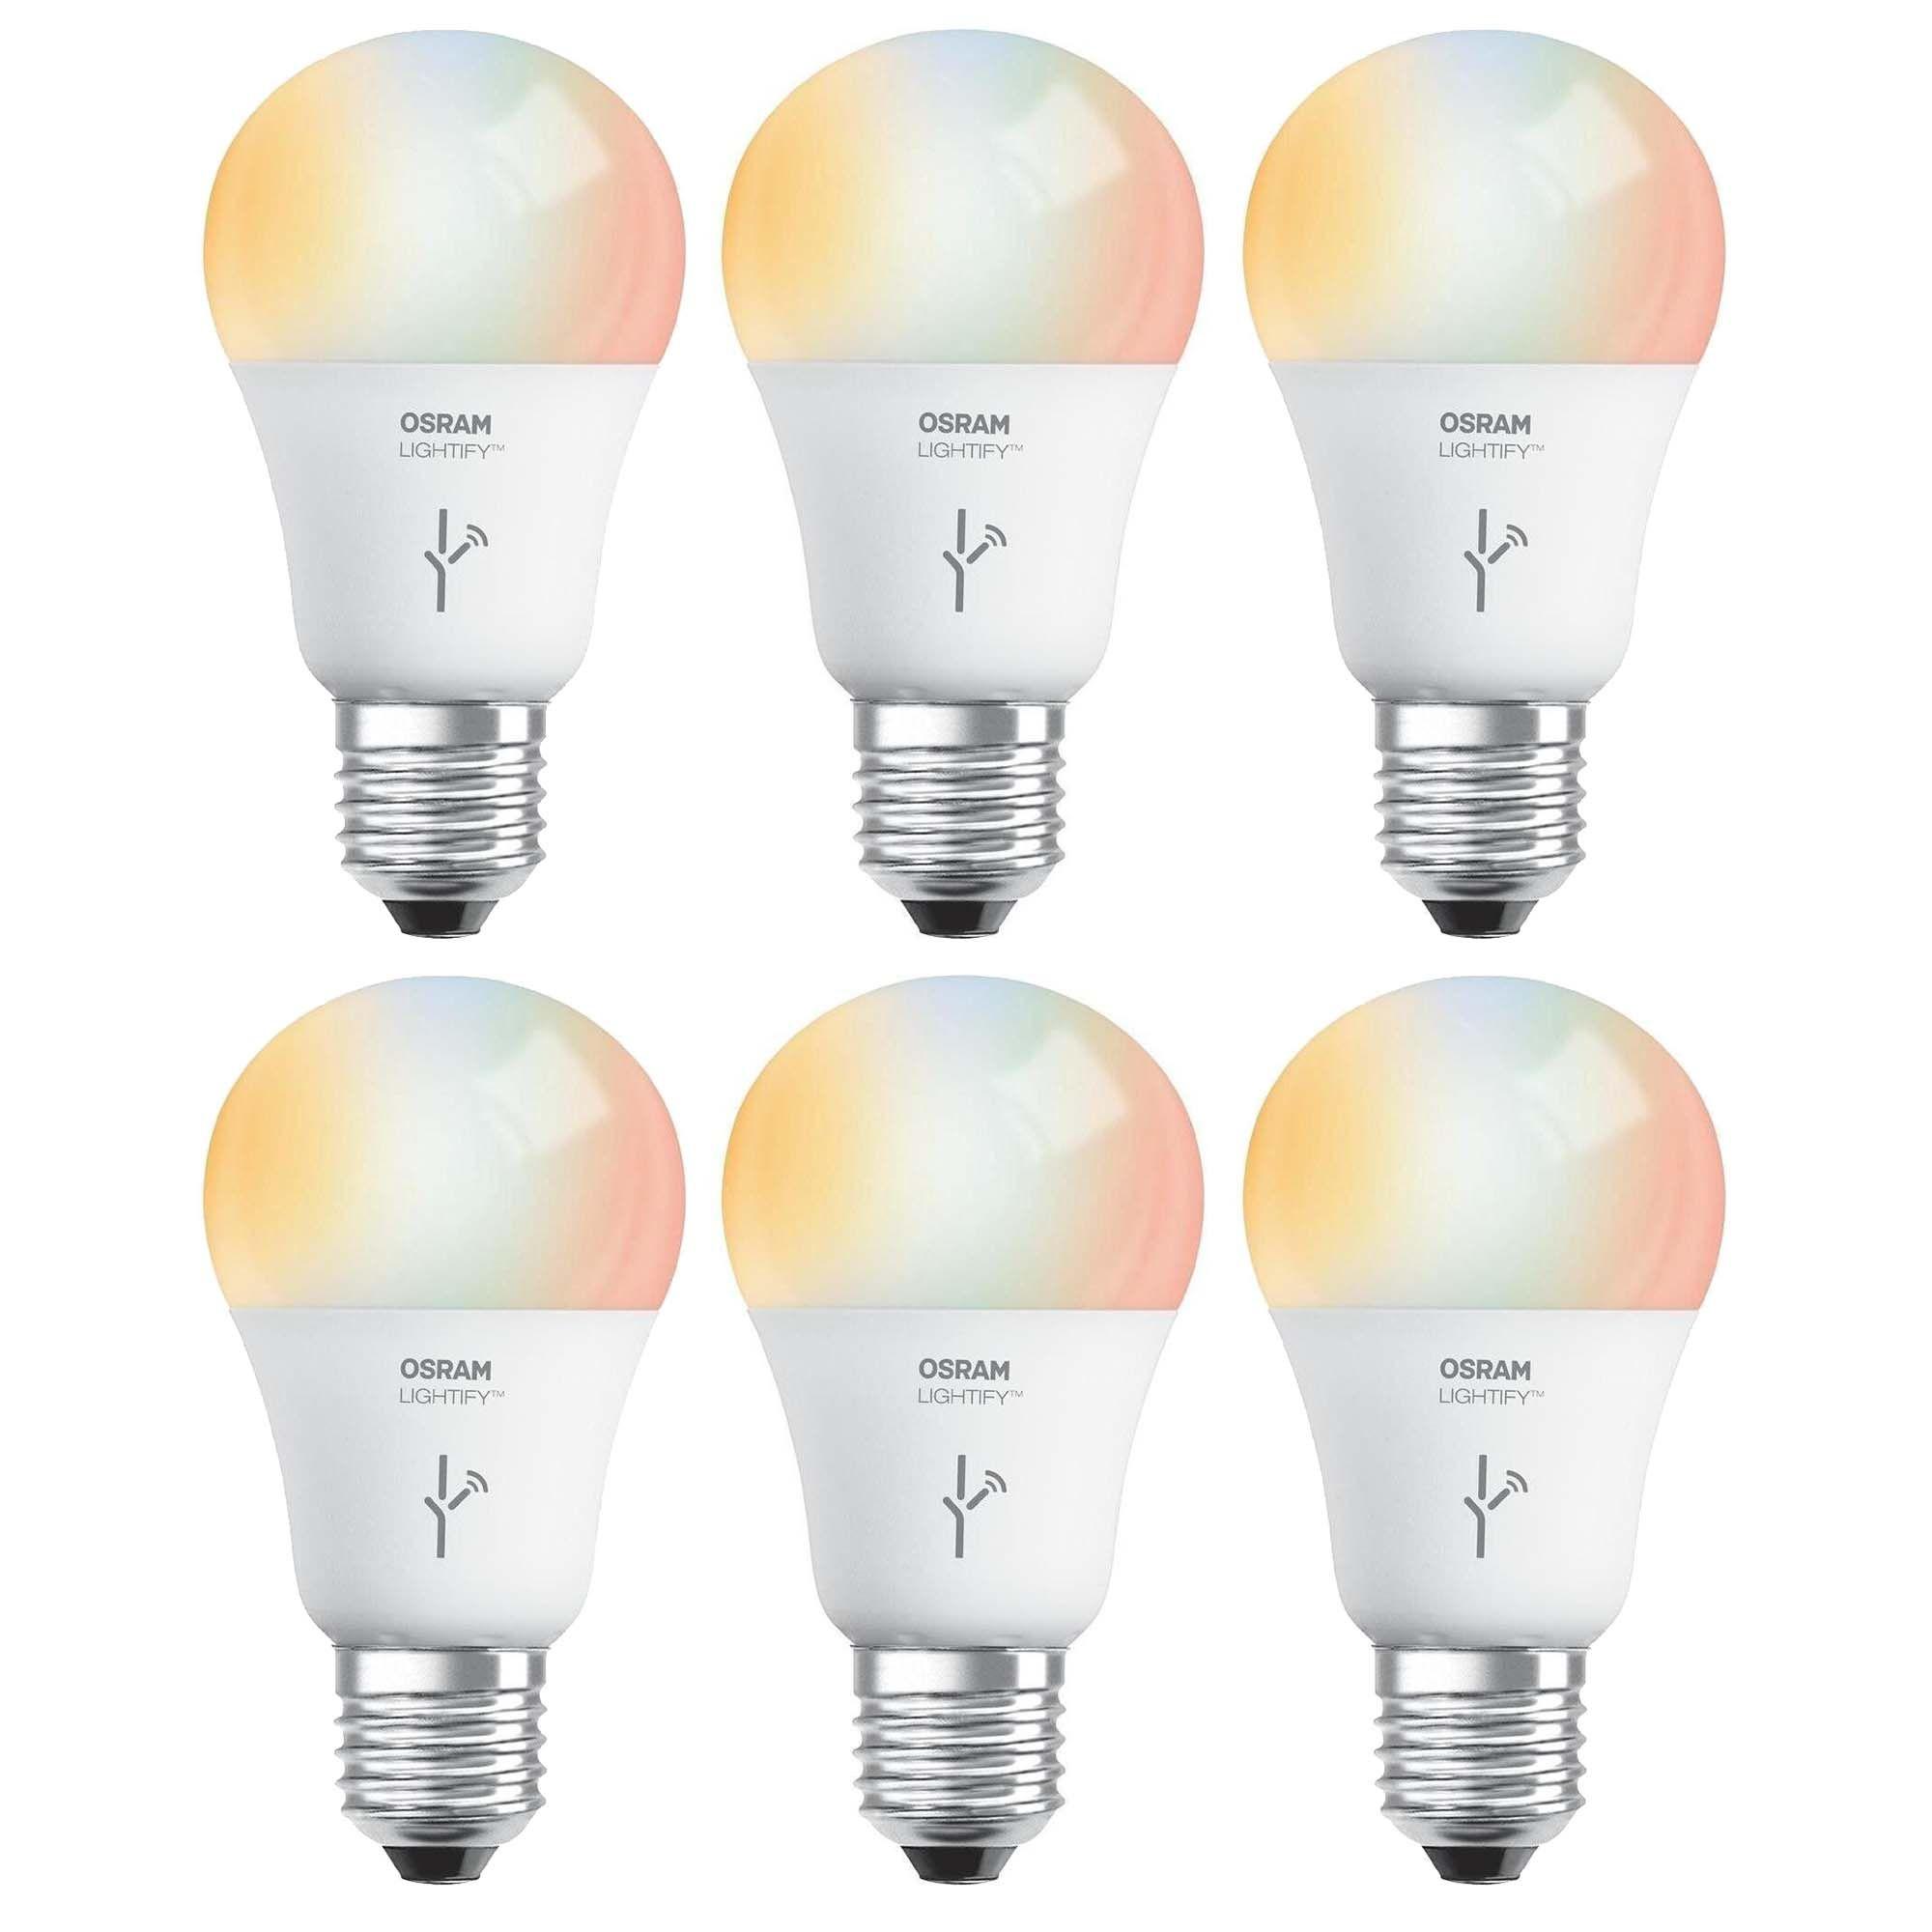 Sylvania Osram Lightify 60w A19 Daylight Rgb Smart Led Light Bulb